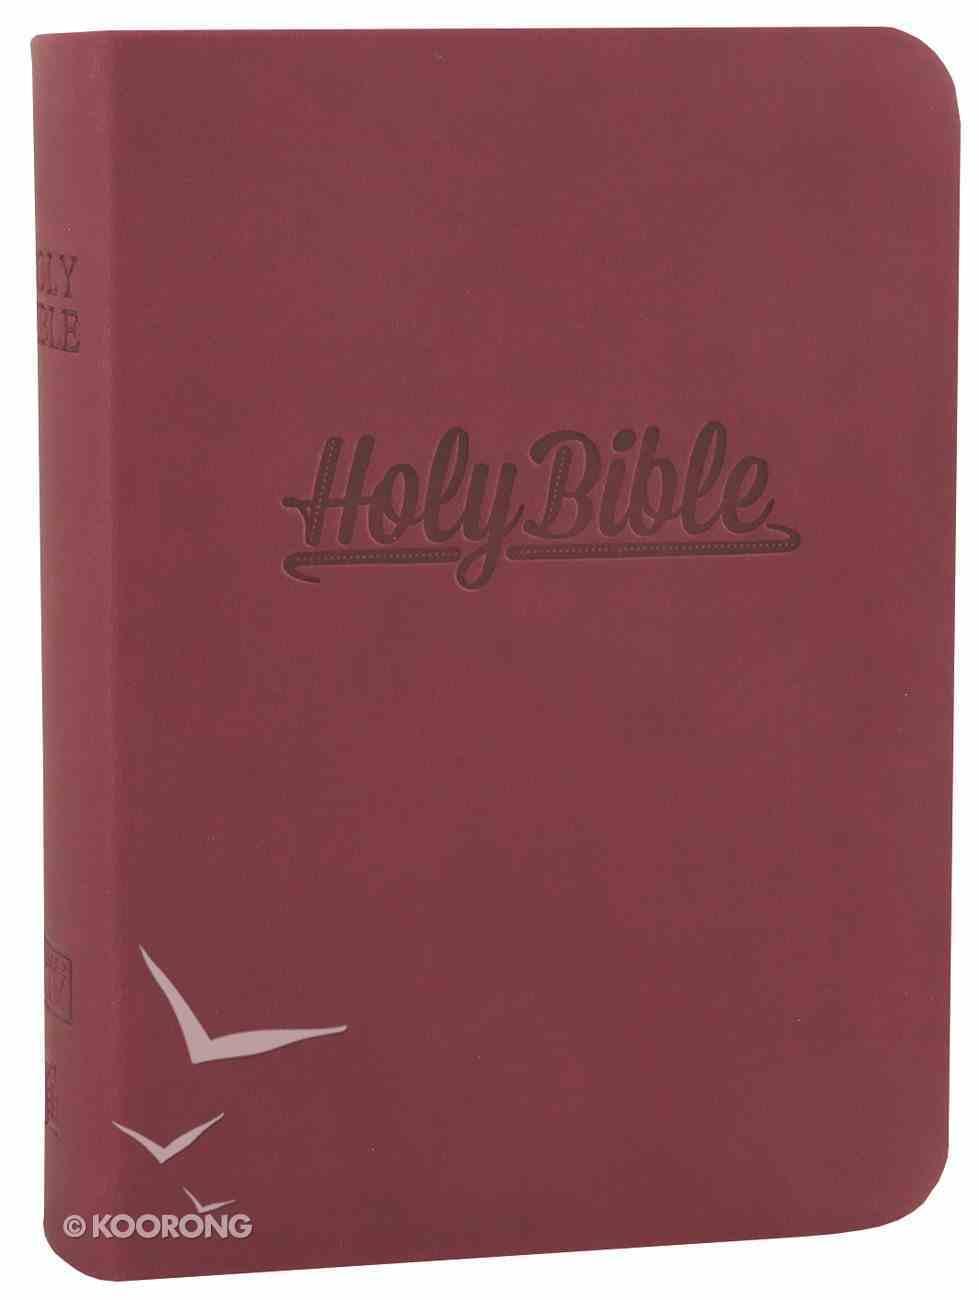 KJV Compact Large Print Reference Bible Burgundy (Essentials) Imitation Leather